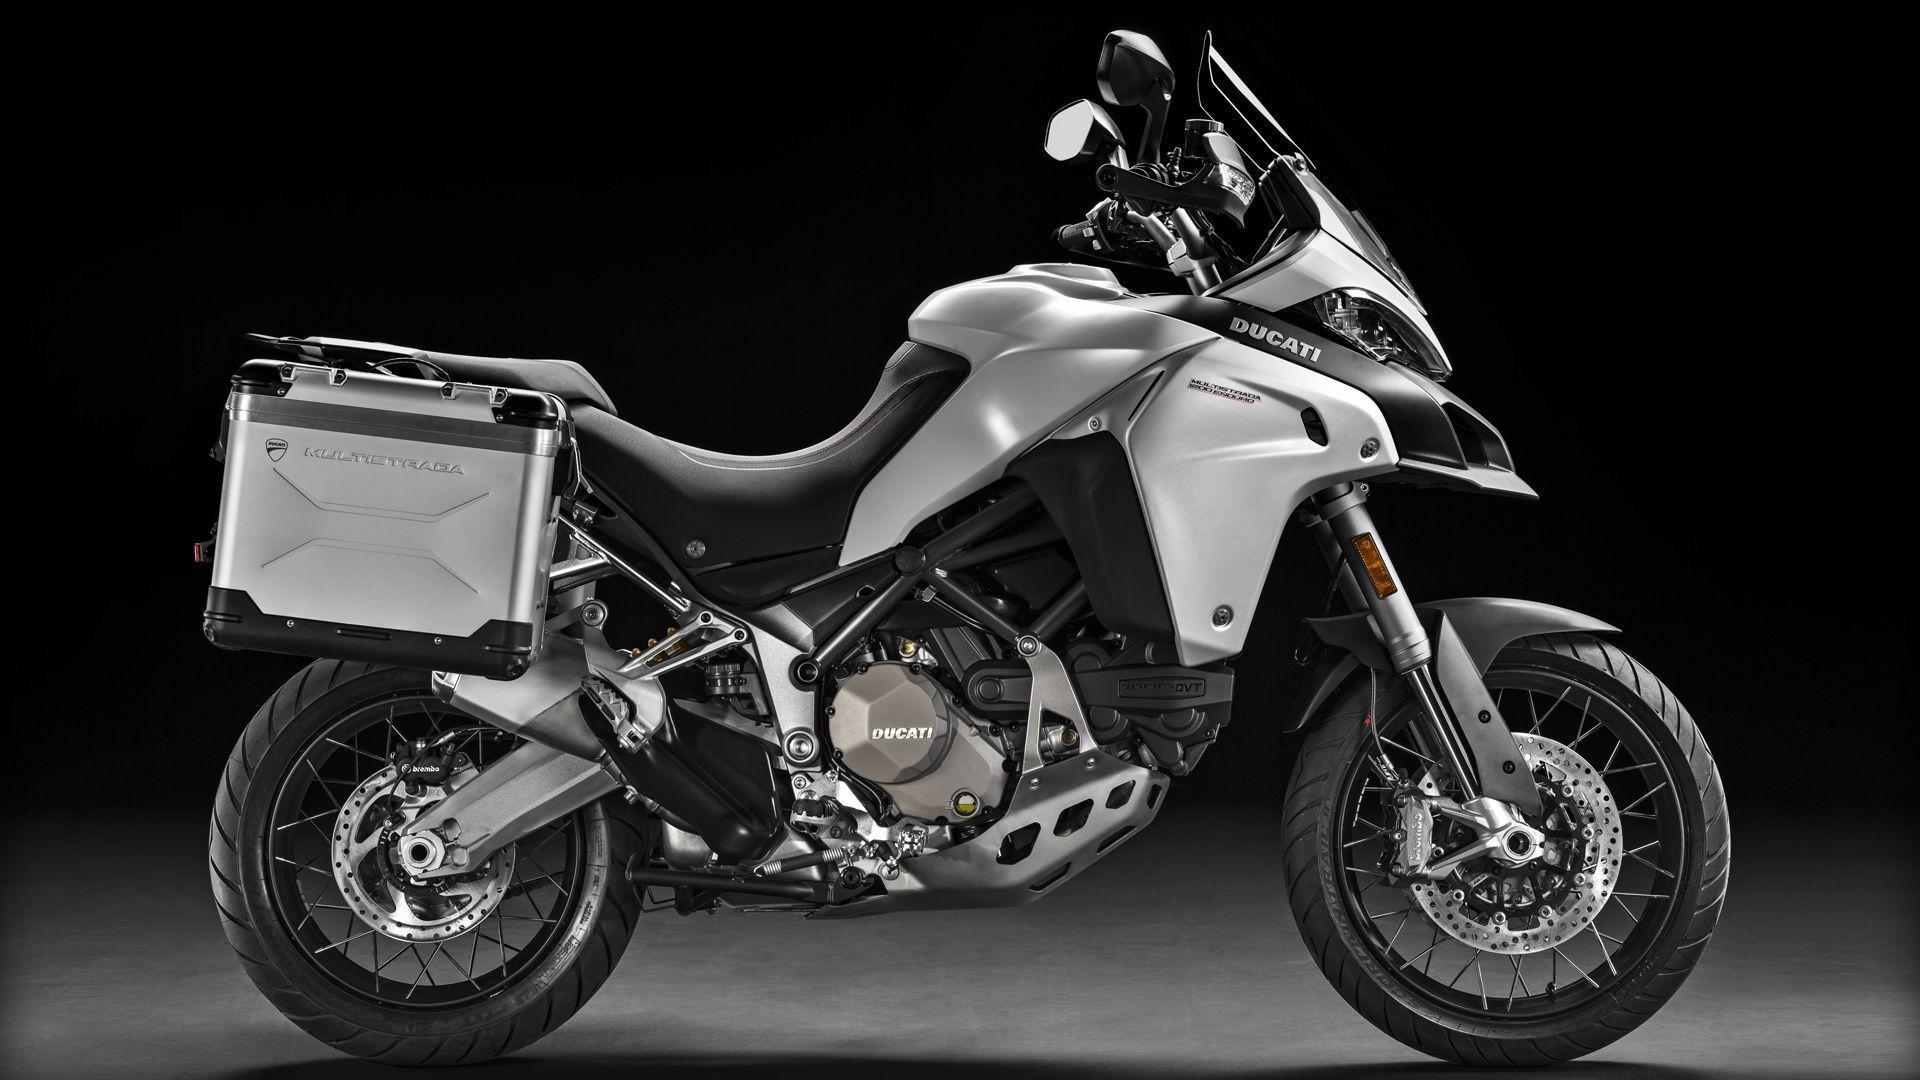 2016 Ducati Multistrada 1200 Enduro   Multistrada 1200 Enduro - Silver Side Angle